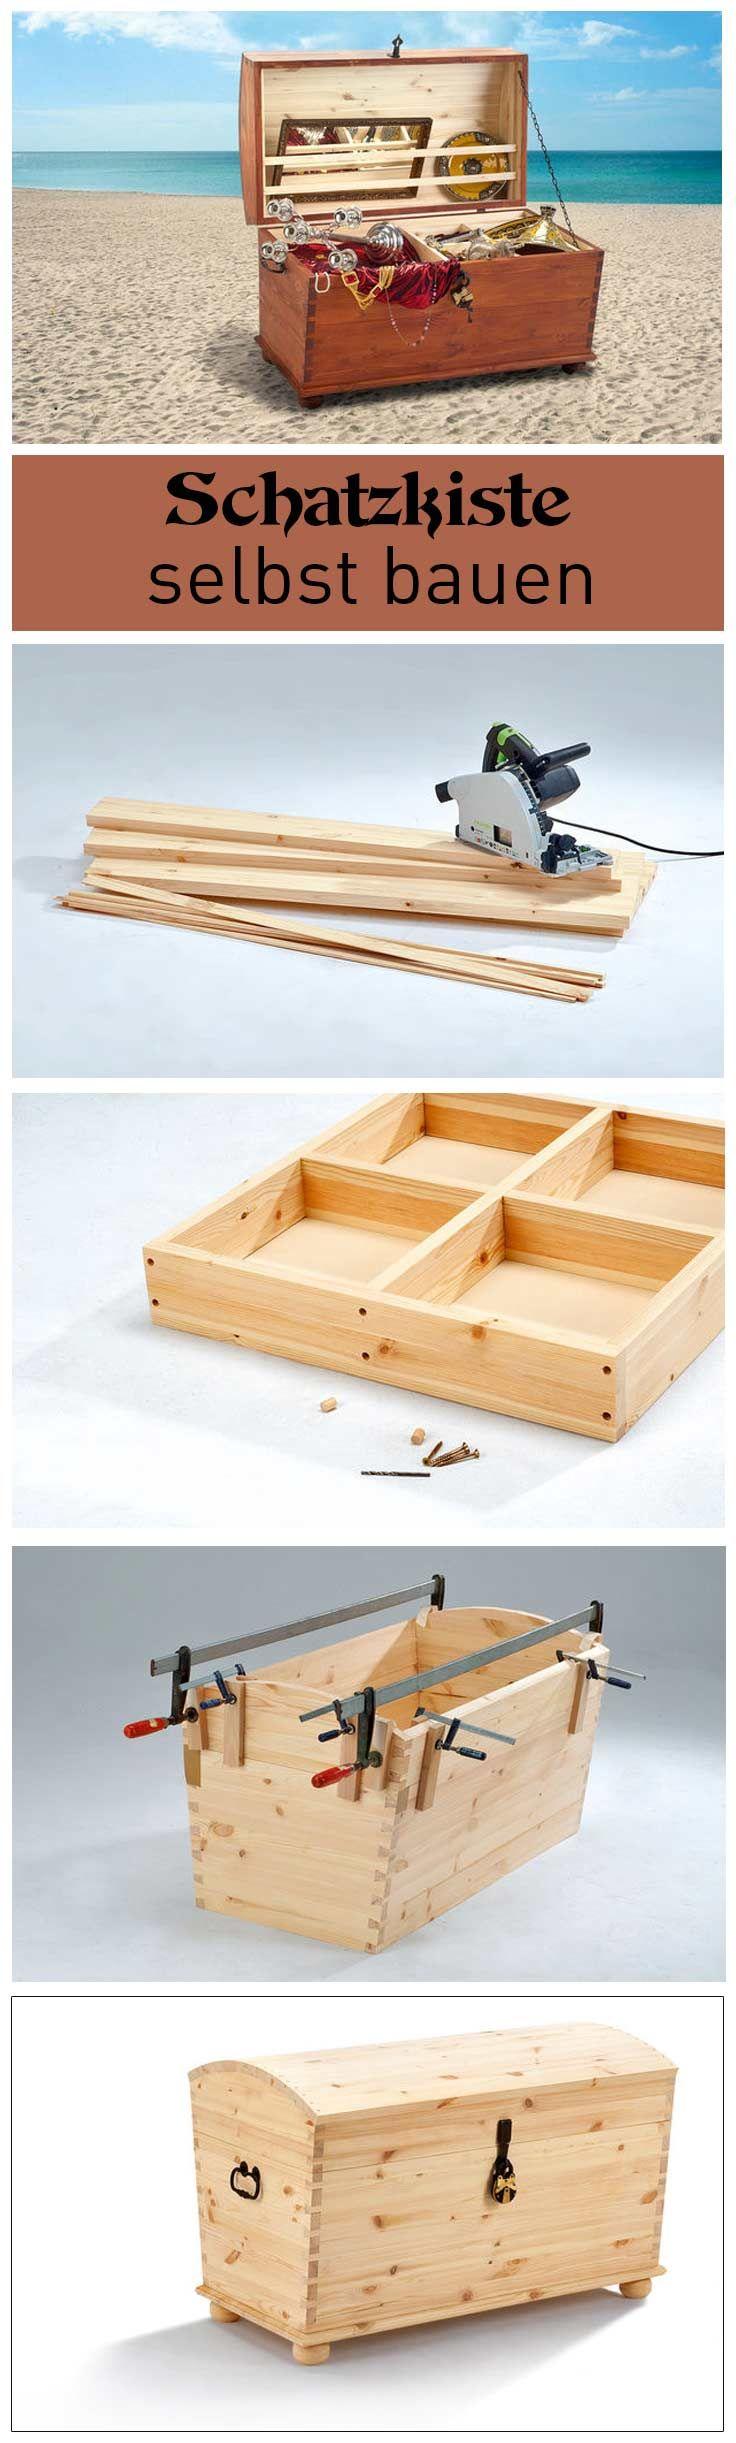 truhe selber bauen tr och inspiration. Black Bedroom Furniture Sets. Home Design Ideas